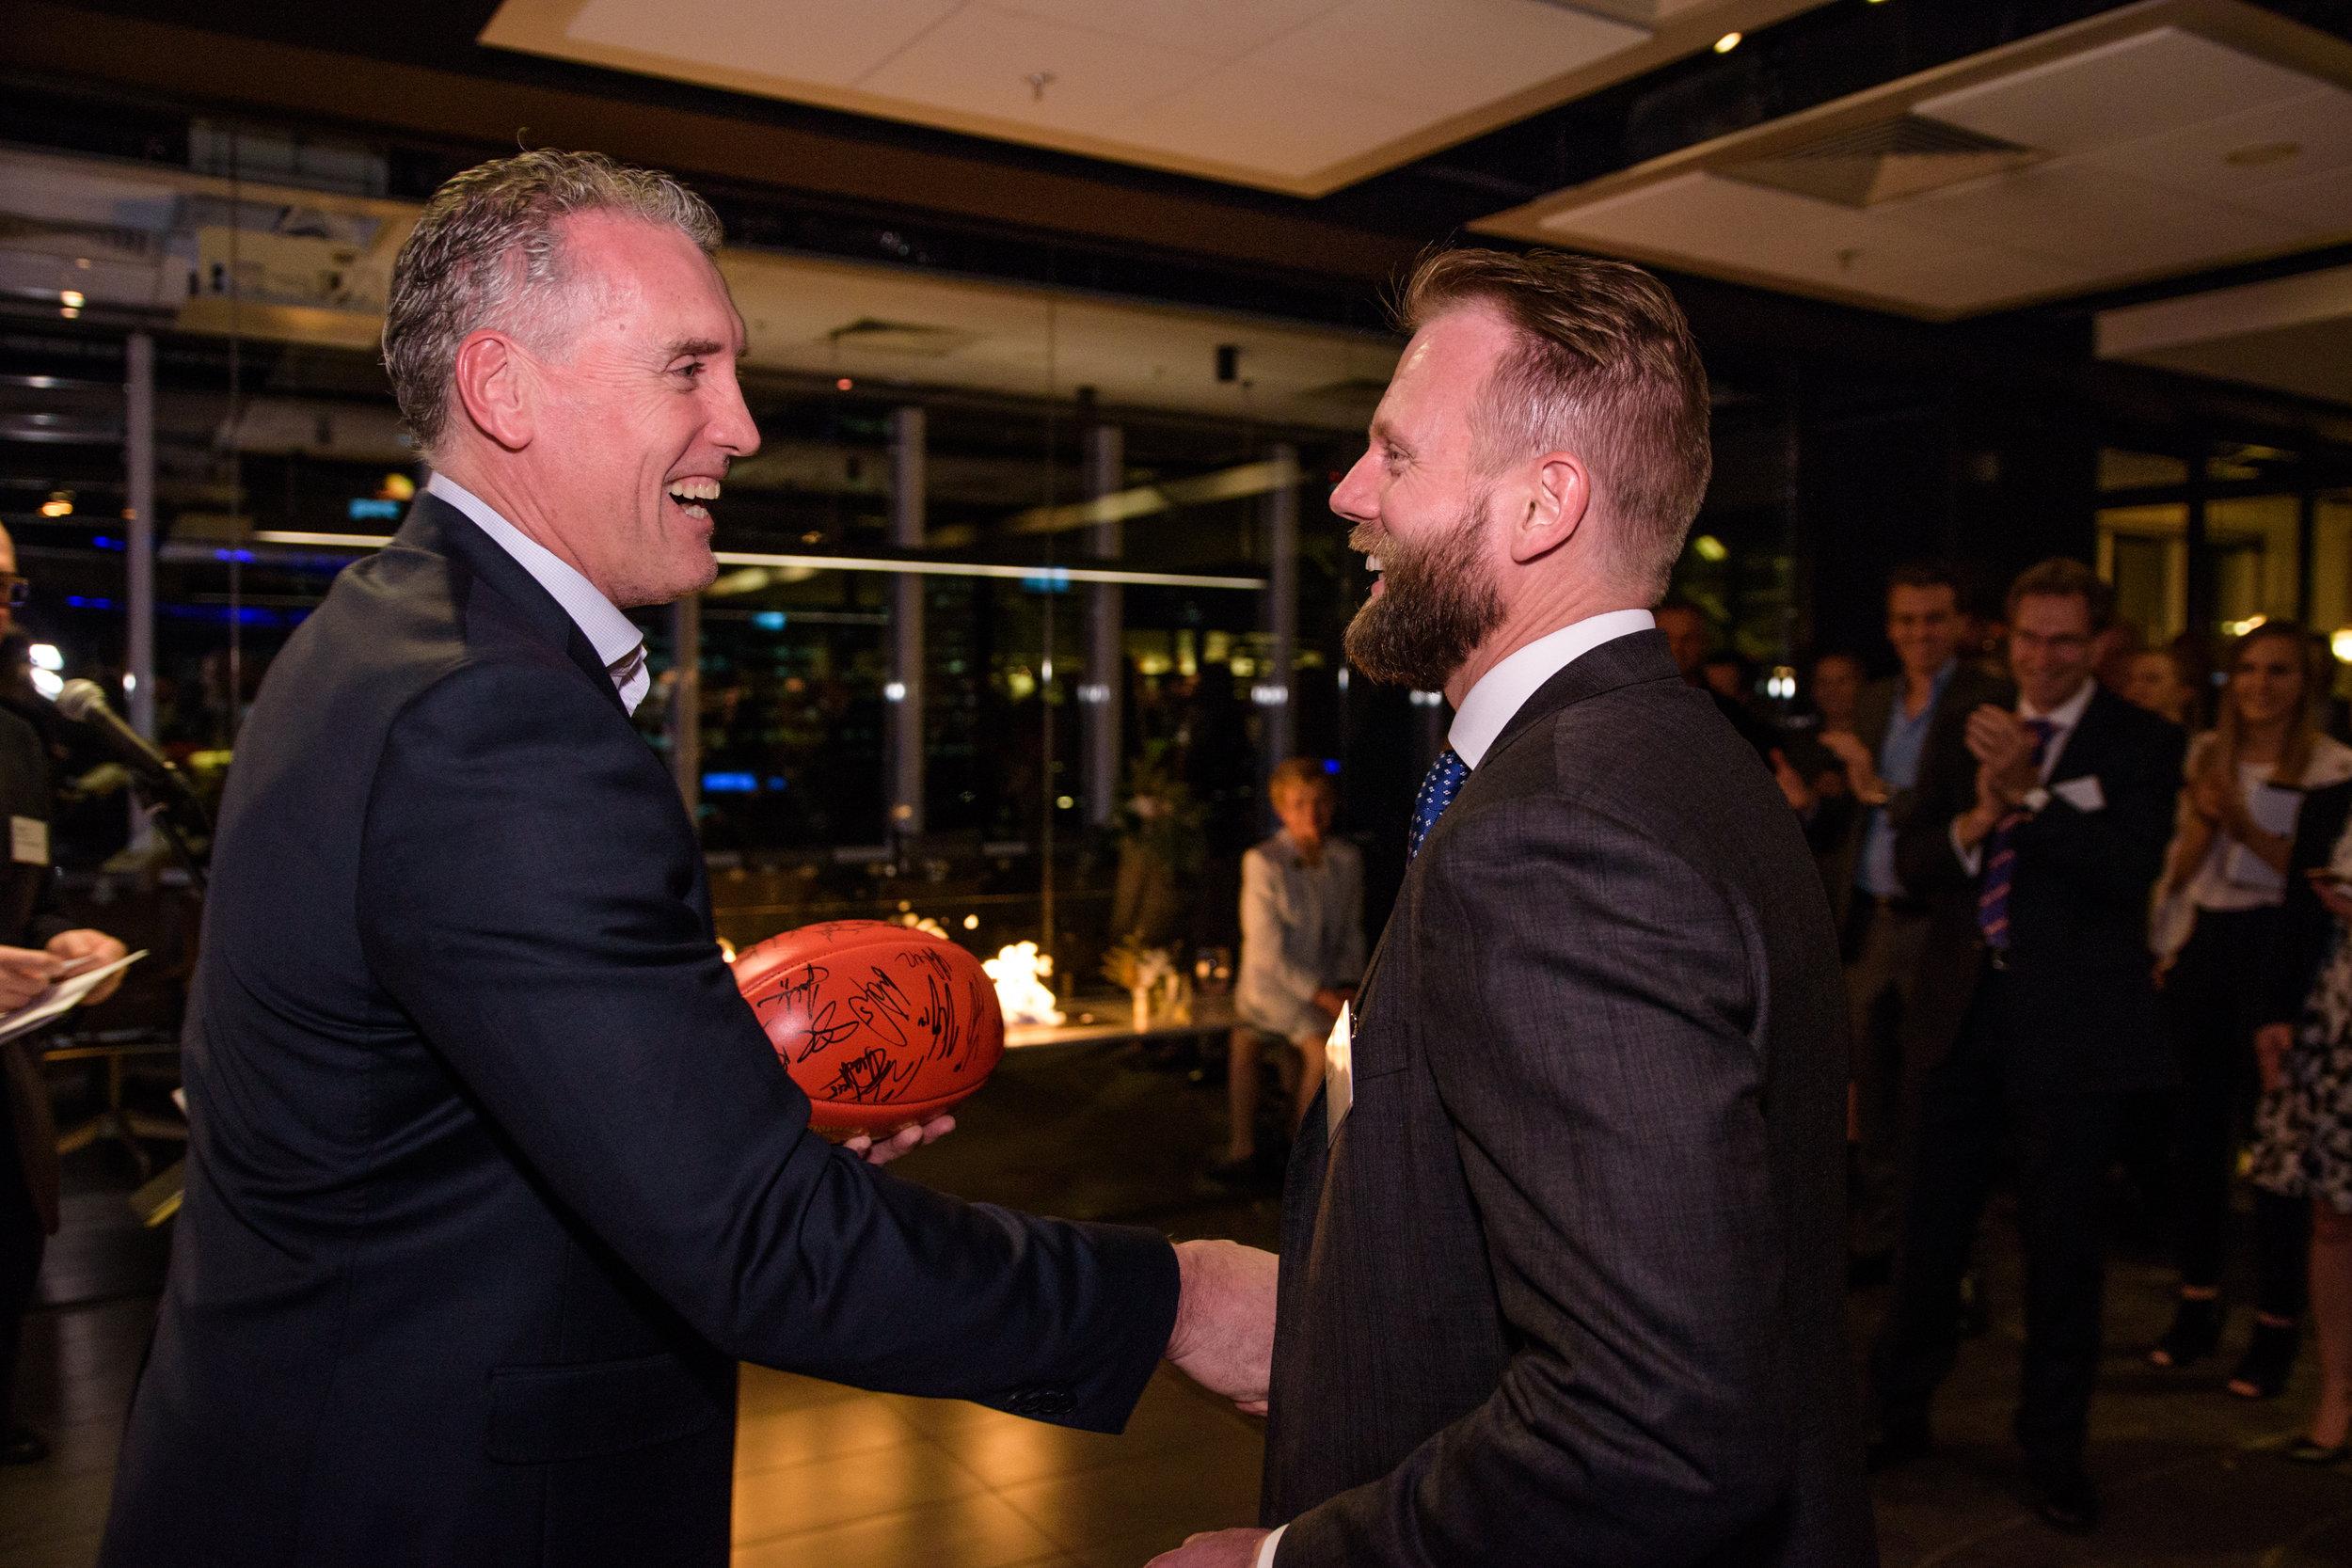 Darren Baxter congratulates Matt Strauch on winning the football signed by the Western Bulldogs Premiership players